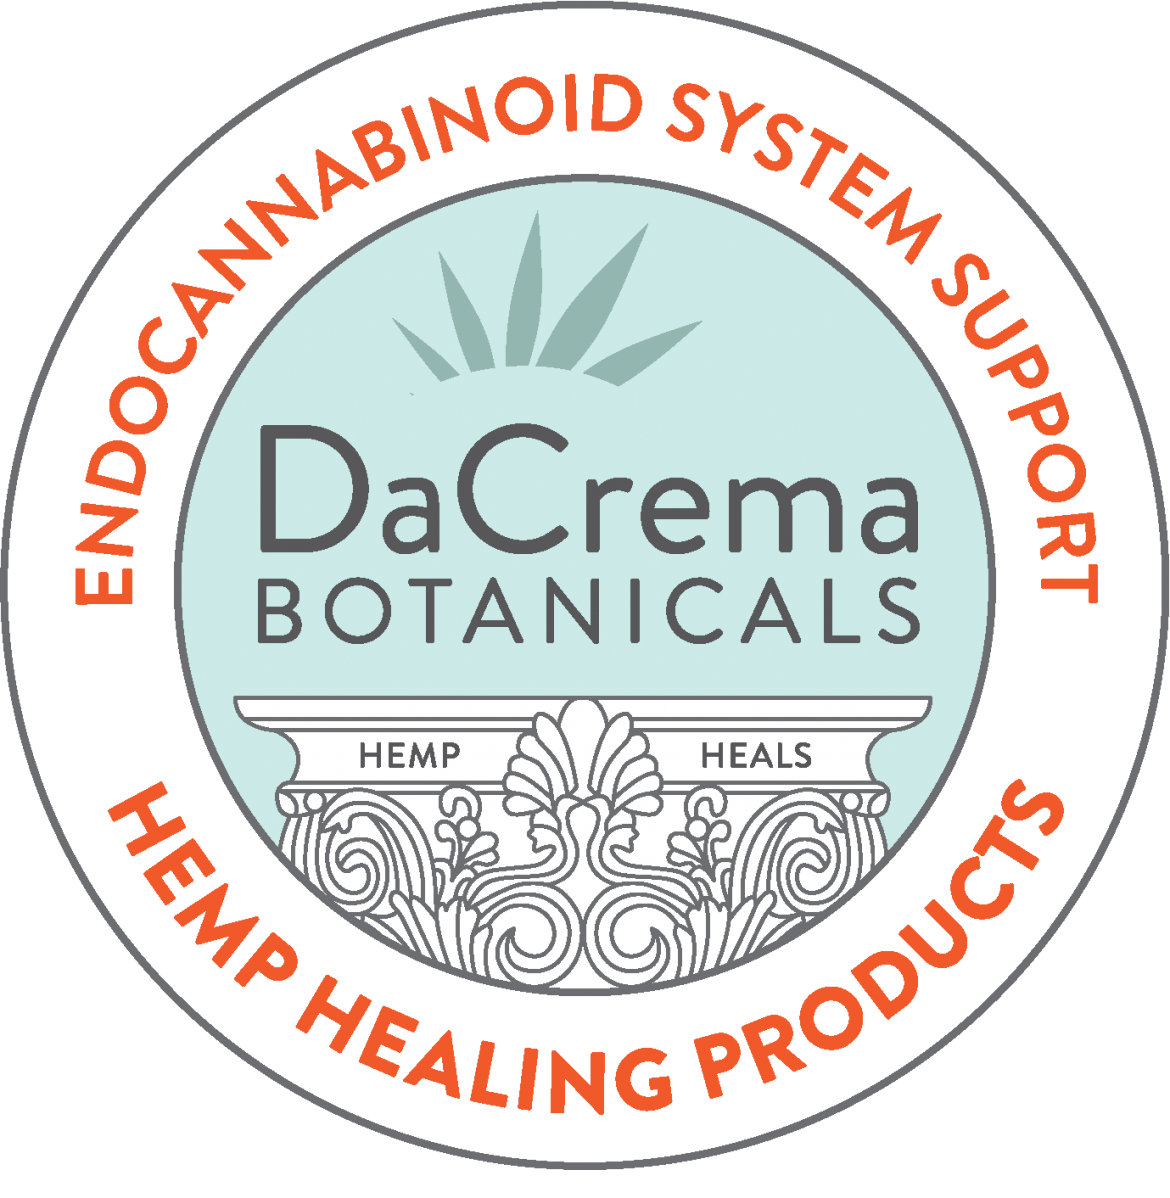 dacrema-botanicals-buy-quality-cbd-products.png